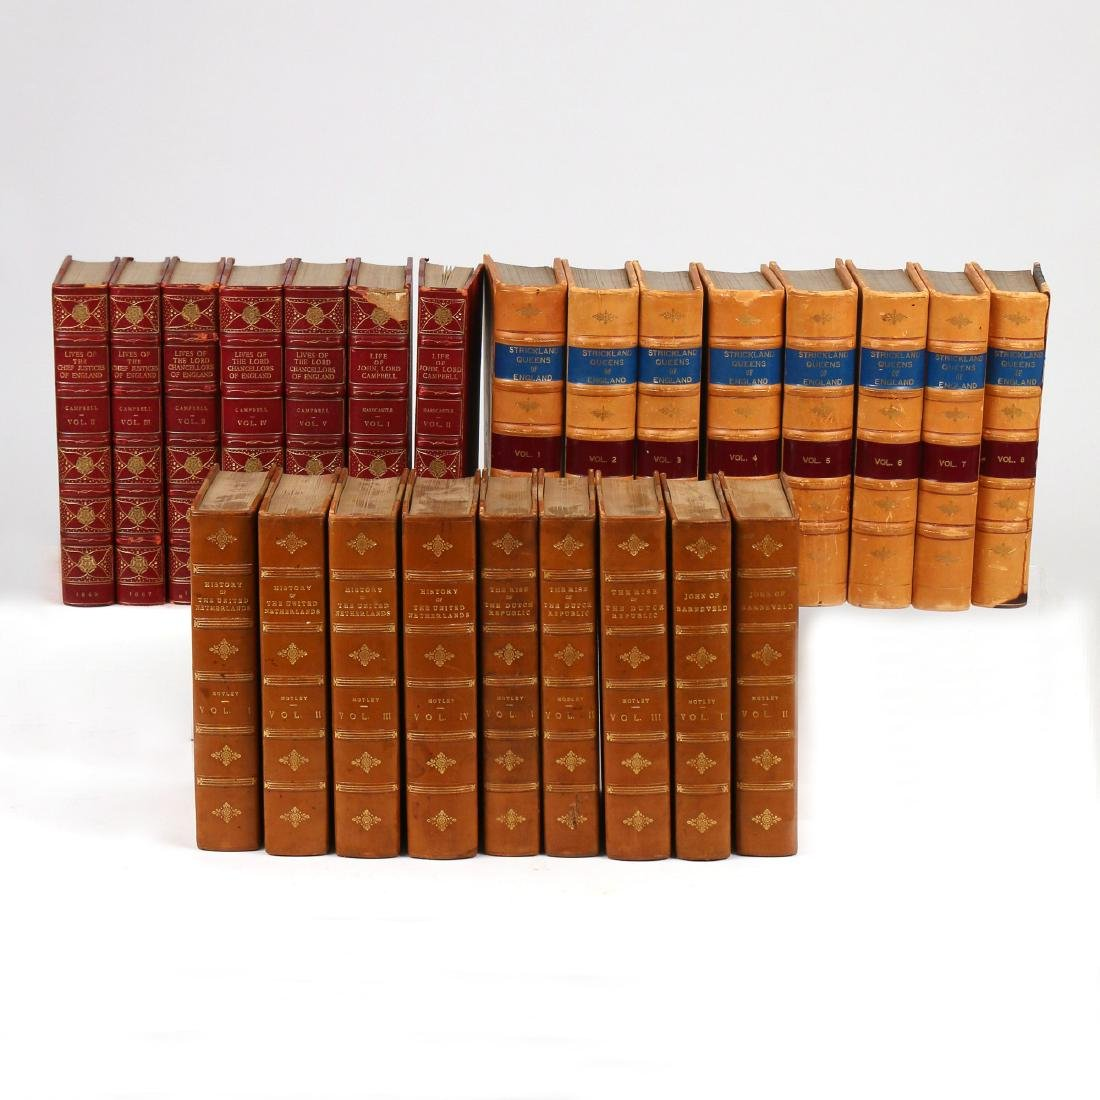 (24vol) [BINDINGS] ENGLISH & EUROPEAN HISTORY